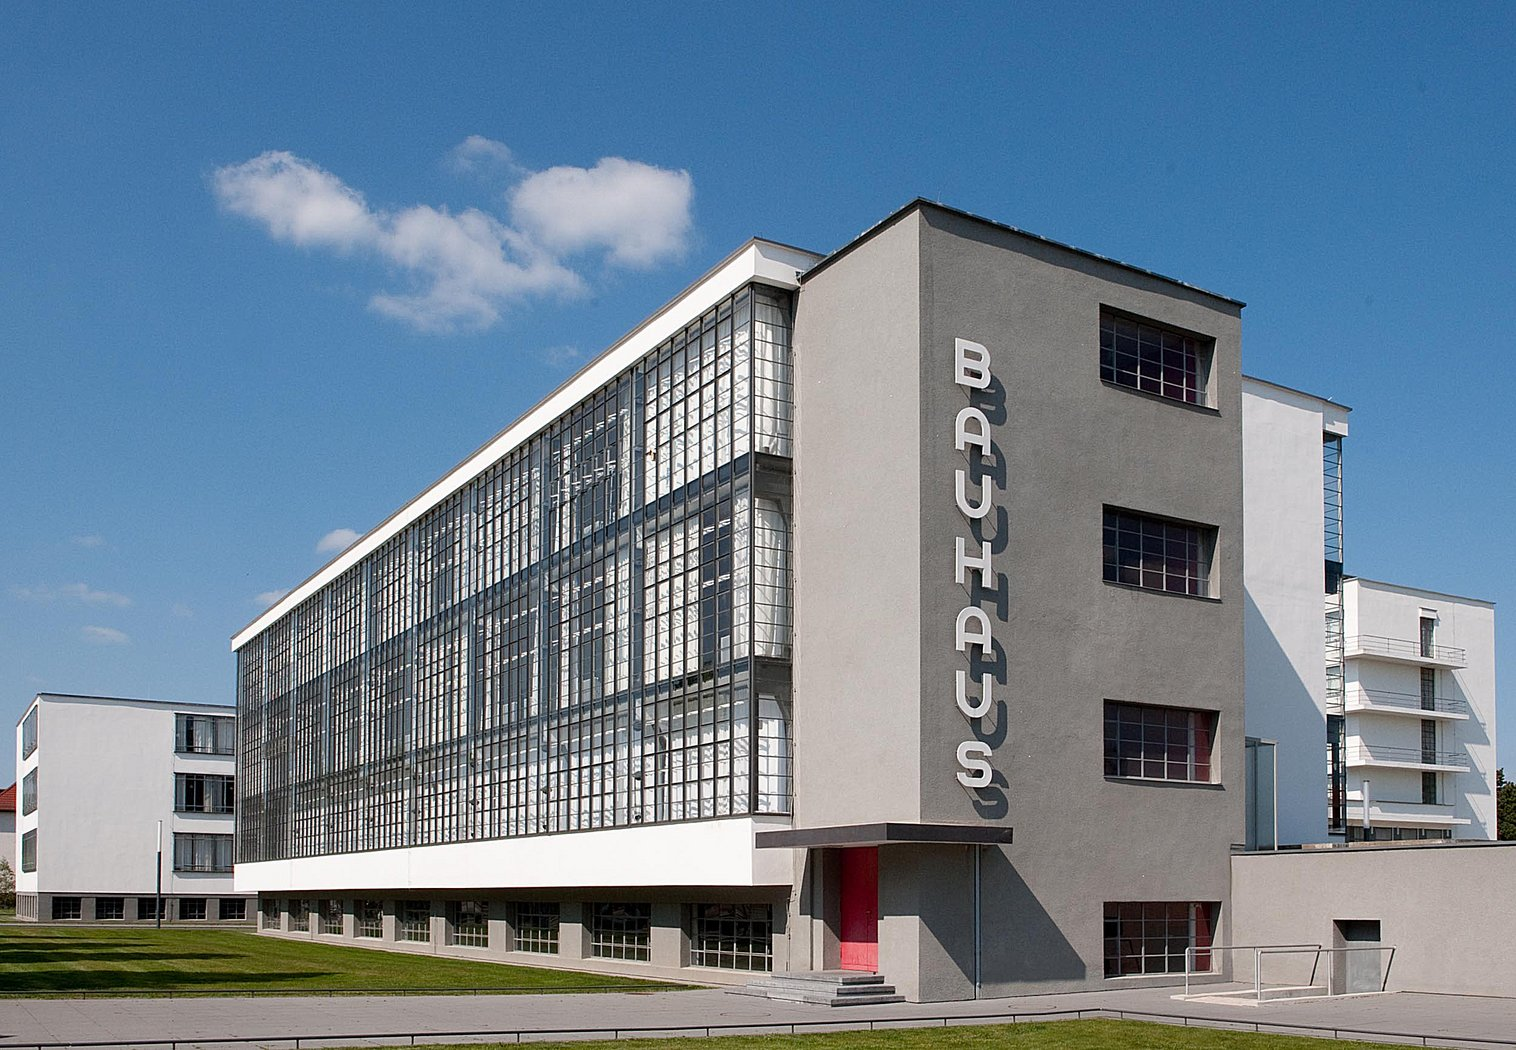 Bauhaus Merkmale das bauhausgebäude walter gropius 1925 26 bauhausgebäude